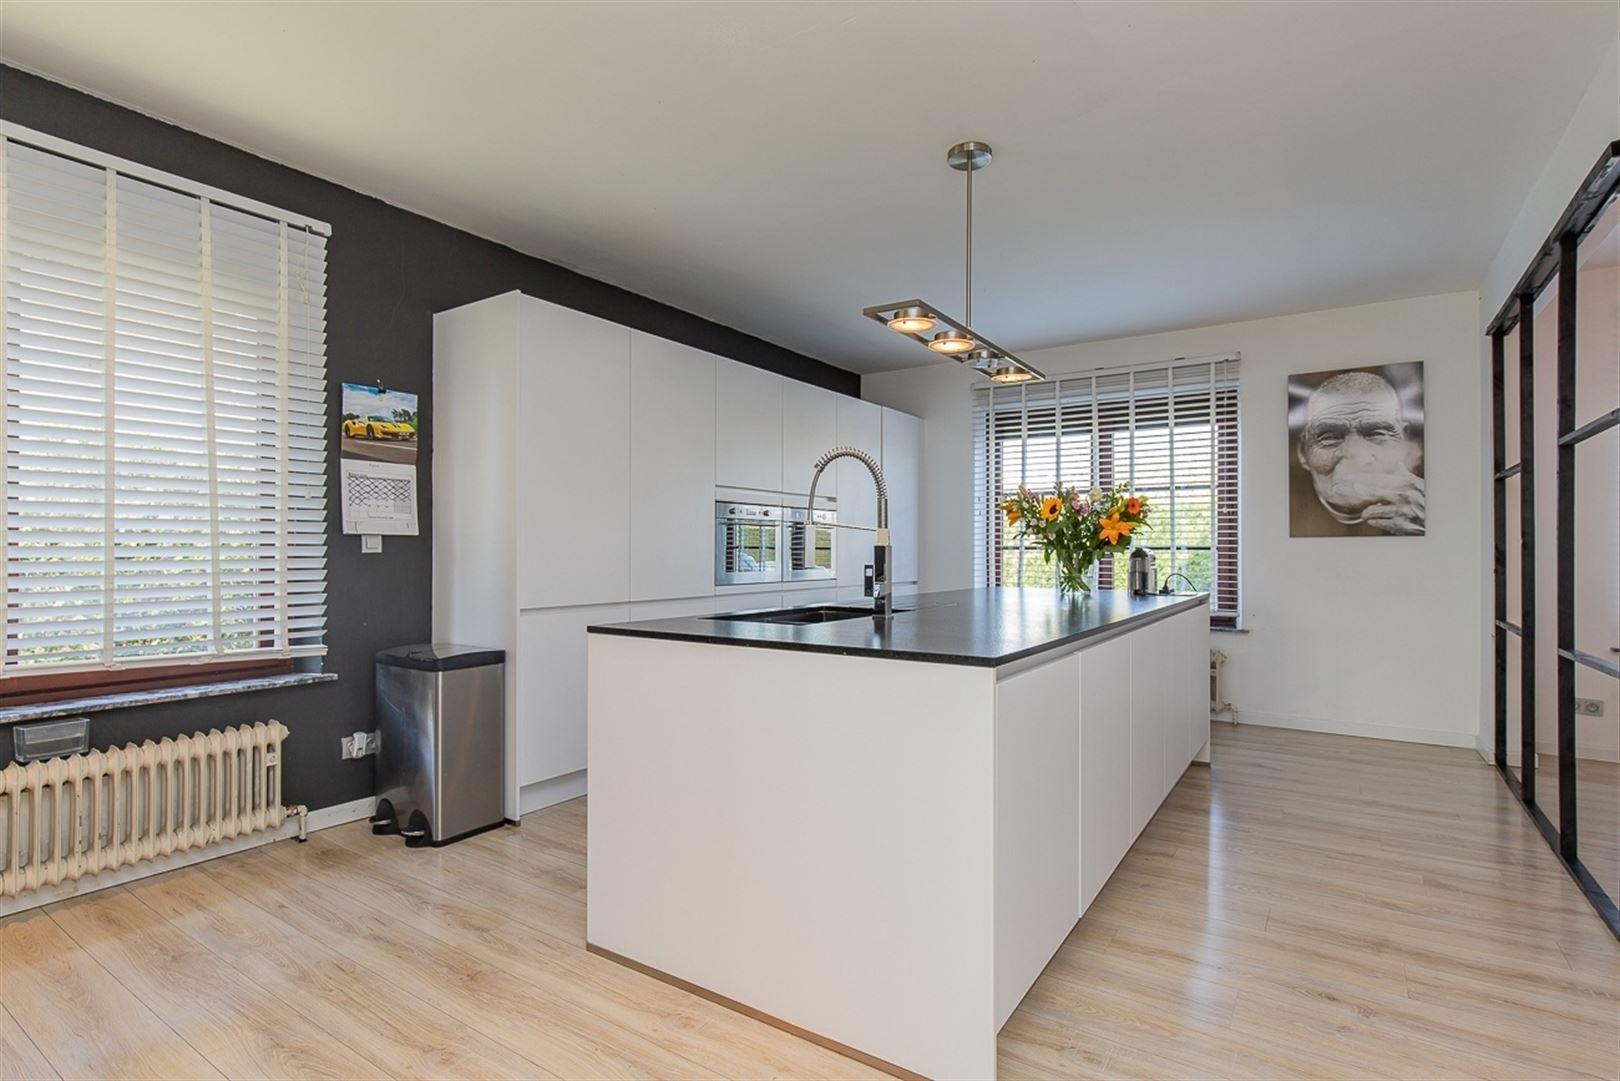 Foto 6 : Villa te 9100 SINT-NIKLAAS (België) - Prijs € 549.000